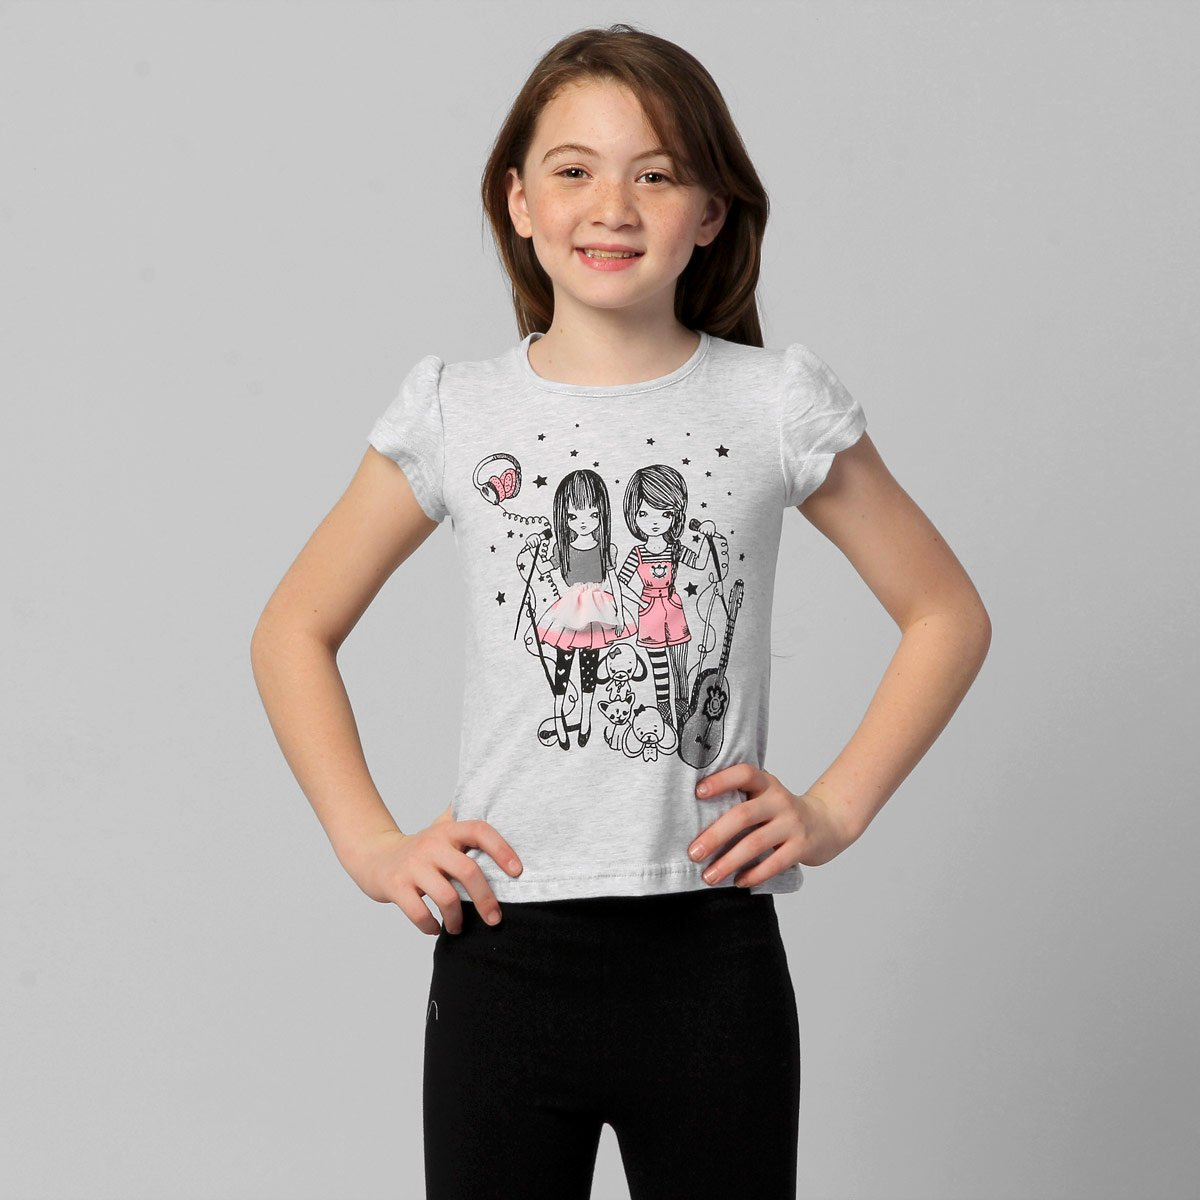 Camiseta Corinthians Meninas Corinthianismo Infantil - Compre Agora ... 1fd9aa374cb71